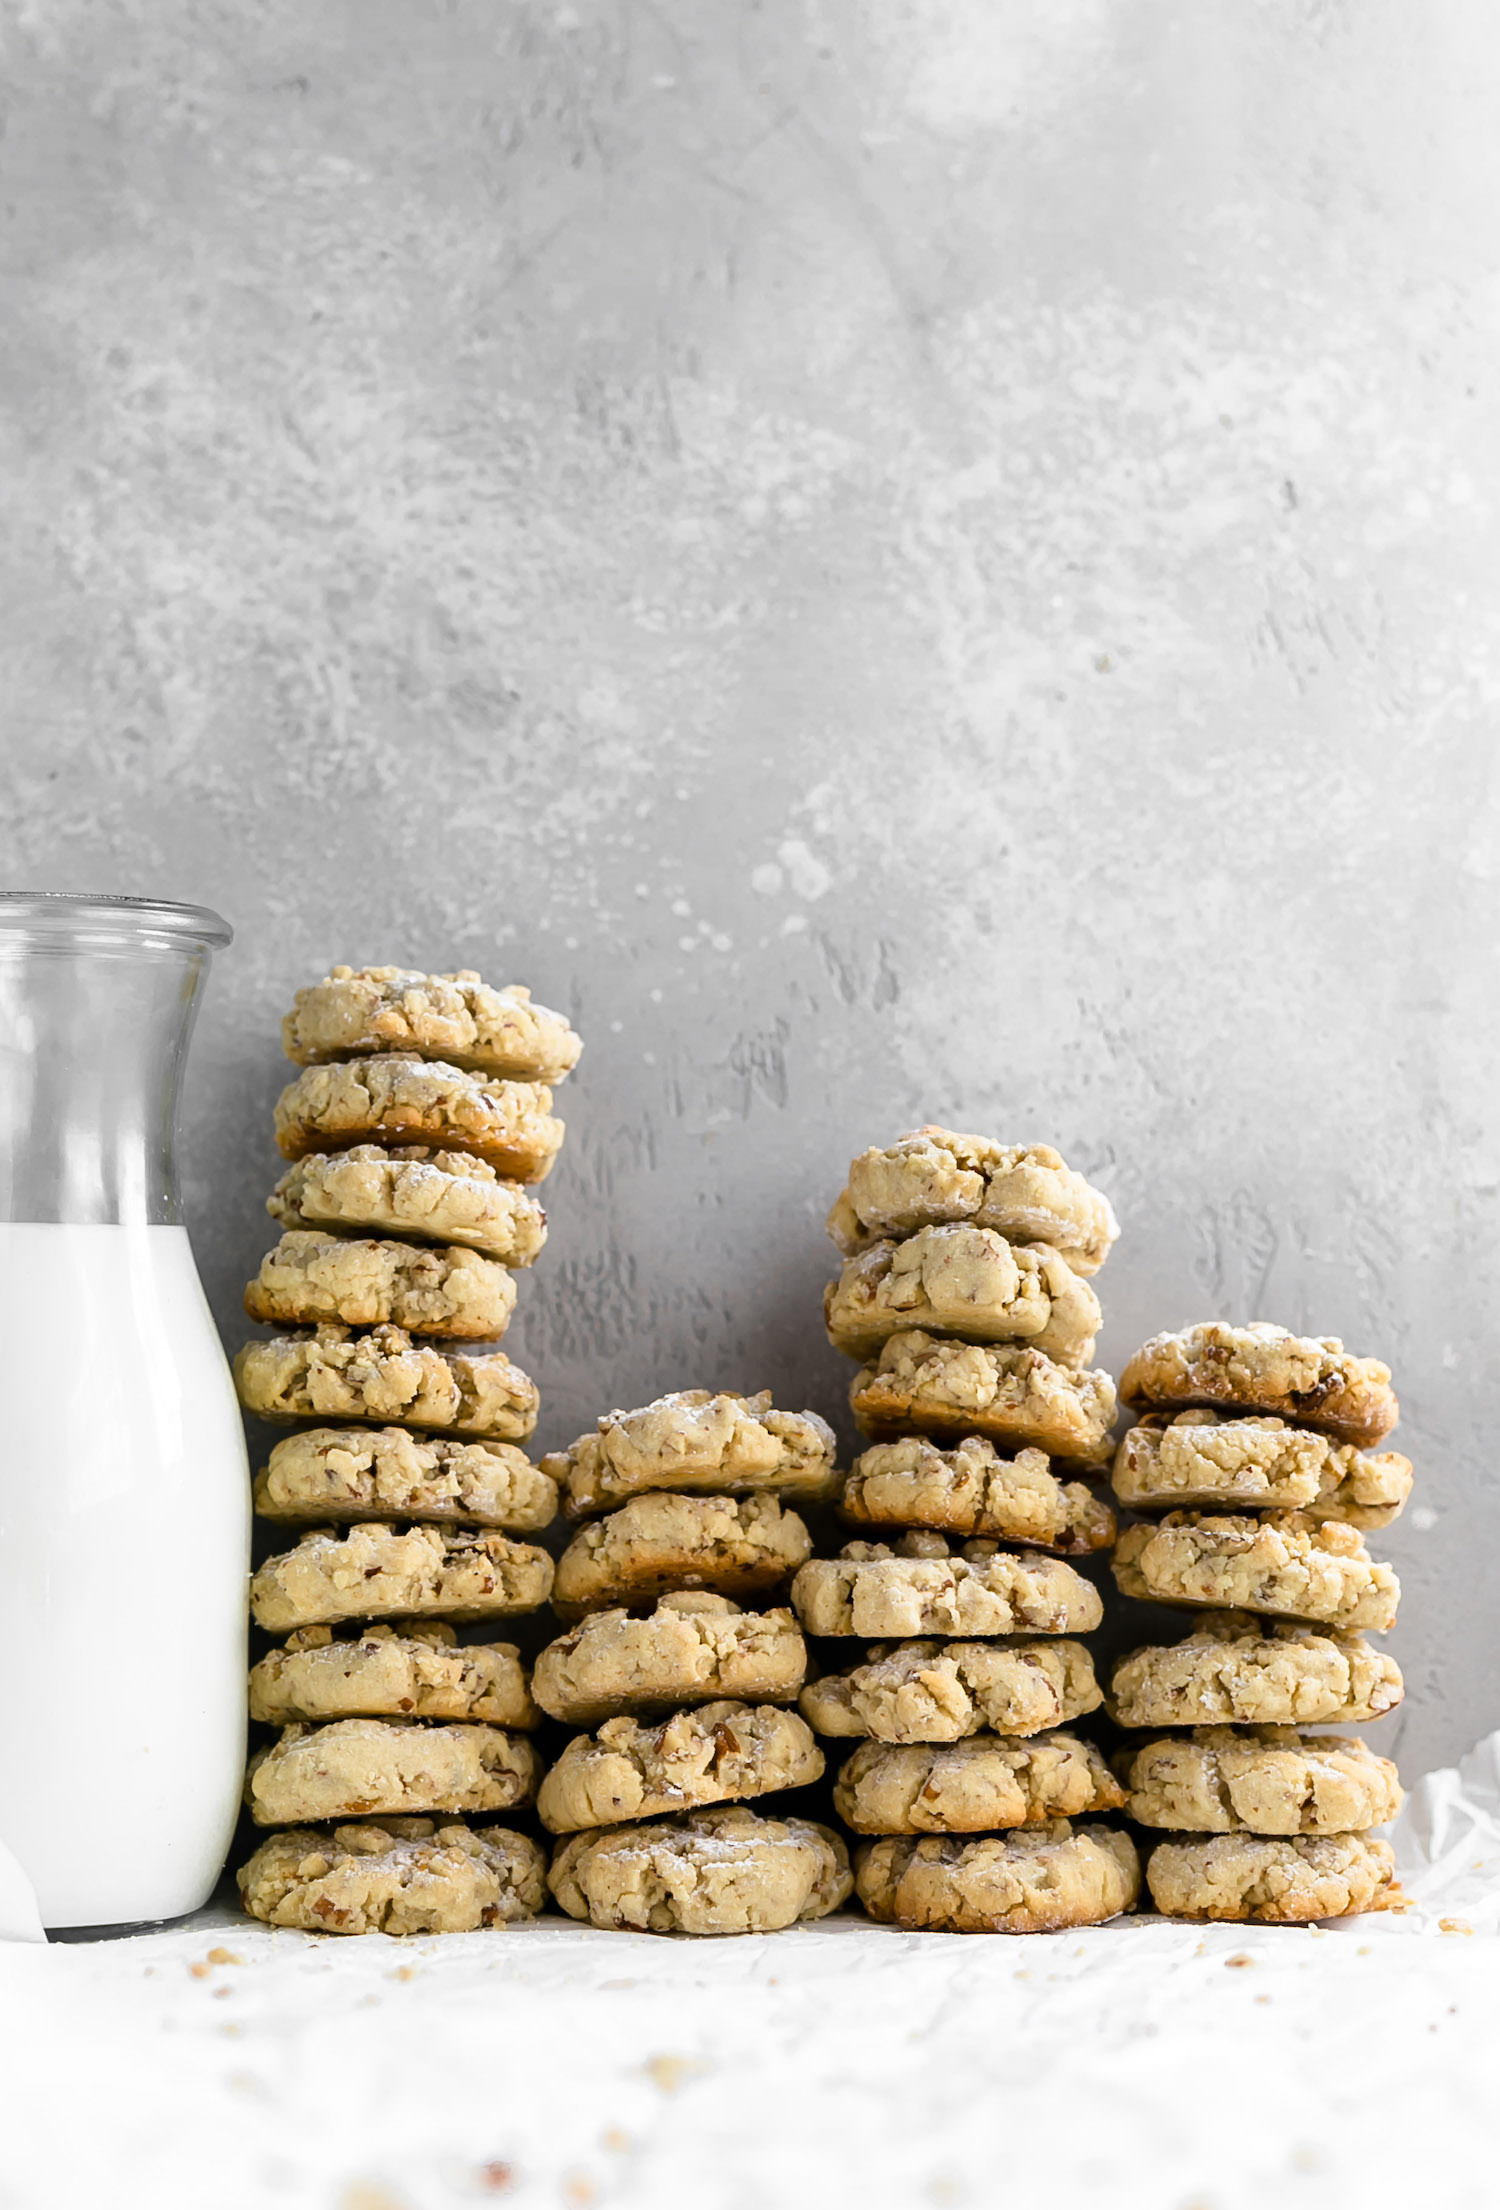 Pecan Shortbread Cookies: easy, tender, crispy, buttery, melt-in-you-mouth pecan shortbread cookies. Too addictive! | TrufflesandTrends.com